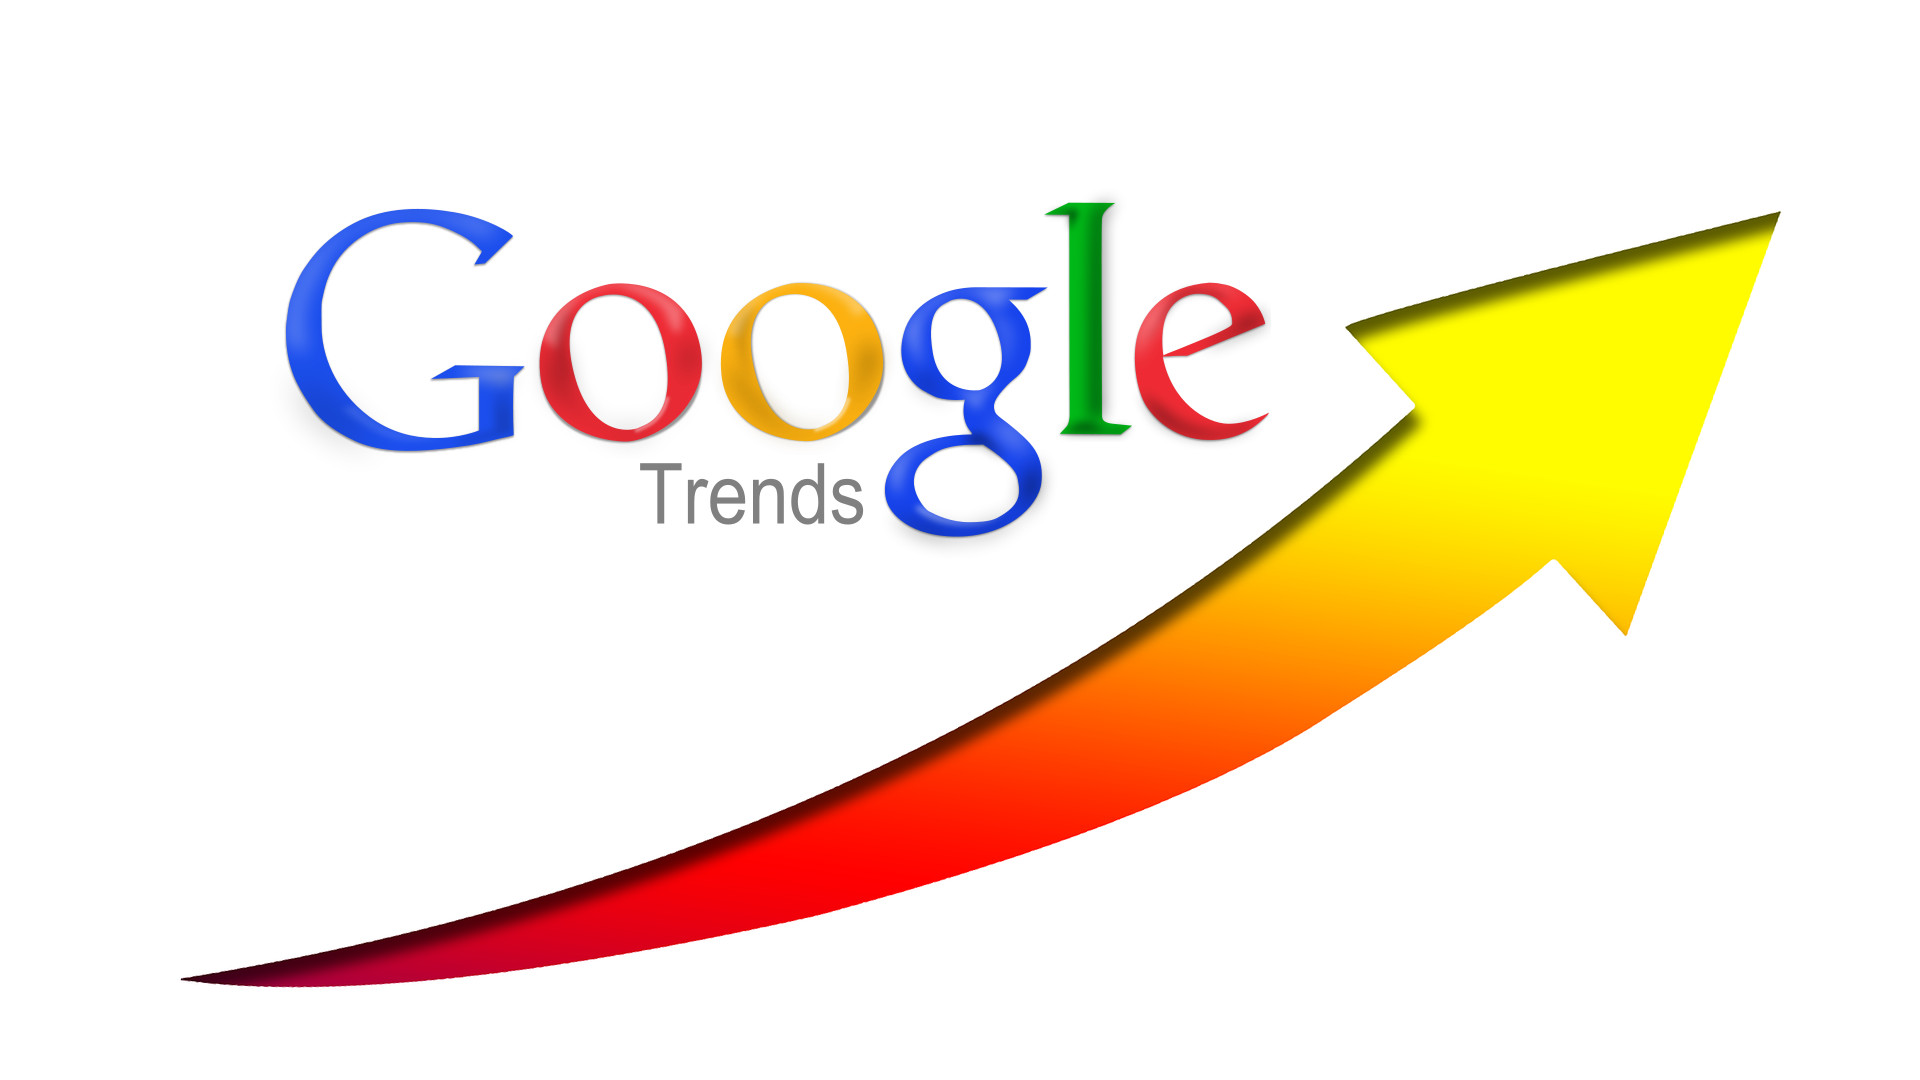 Google, Search Trends, Top 5, Youtube, Mason Vera Paine, Millennial, Google Trends Expert, New York Terrorist Attack, Cheeseburger Emojis, Pyramid of Giza, Lion King Movie, Tiger Woods